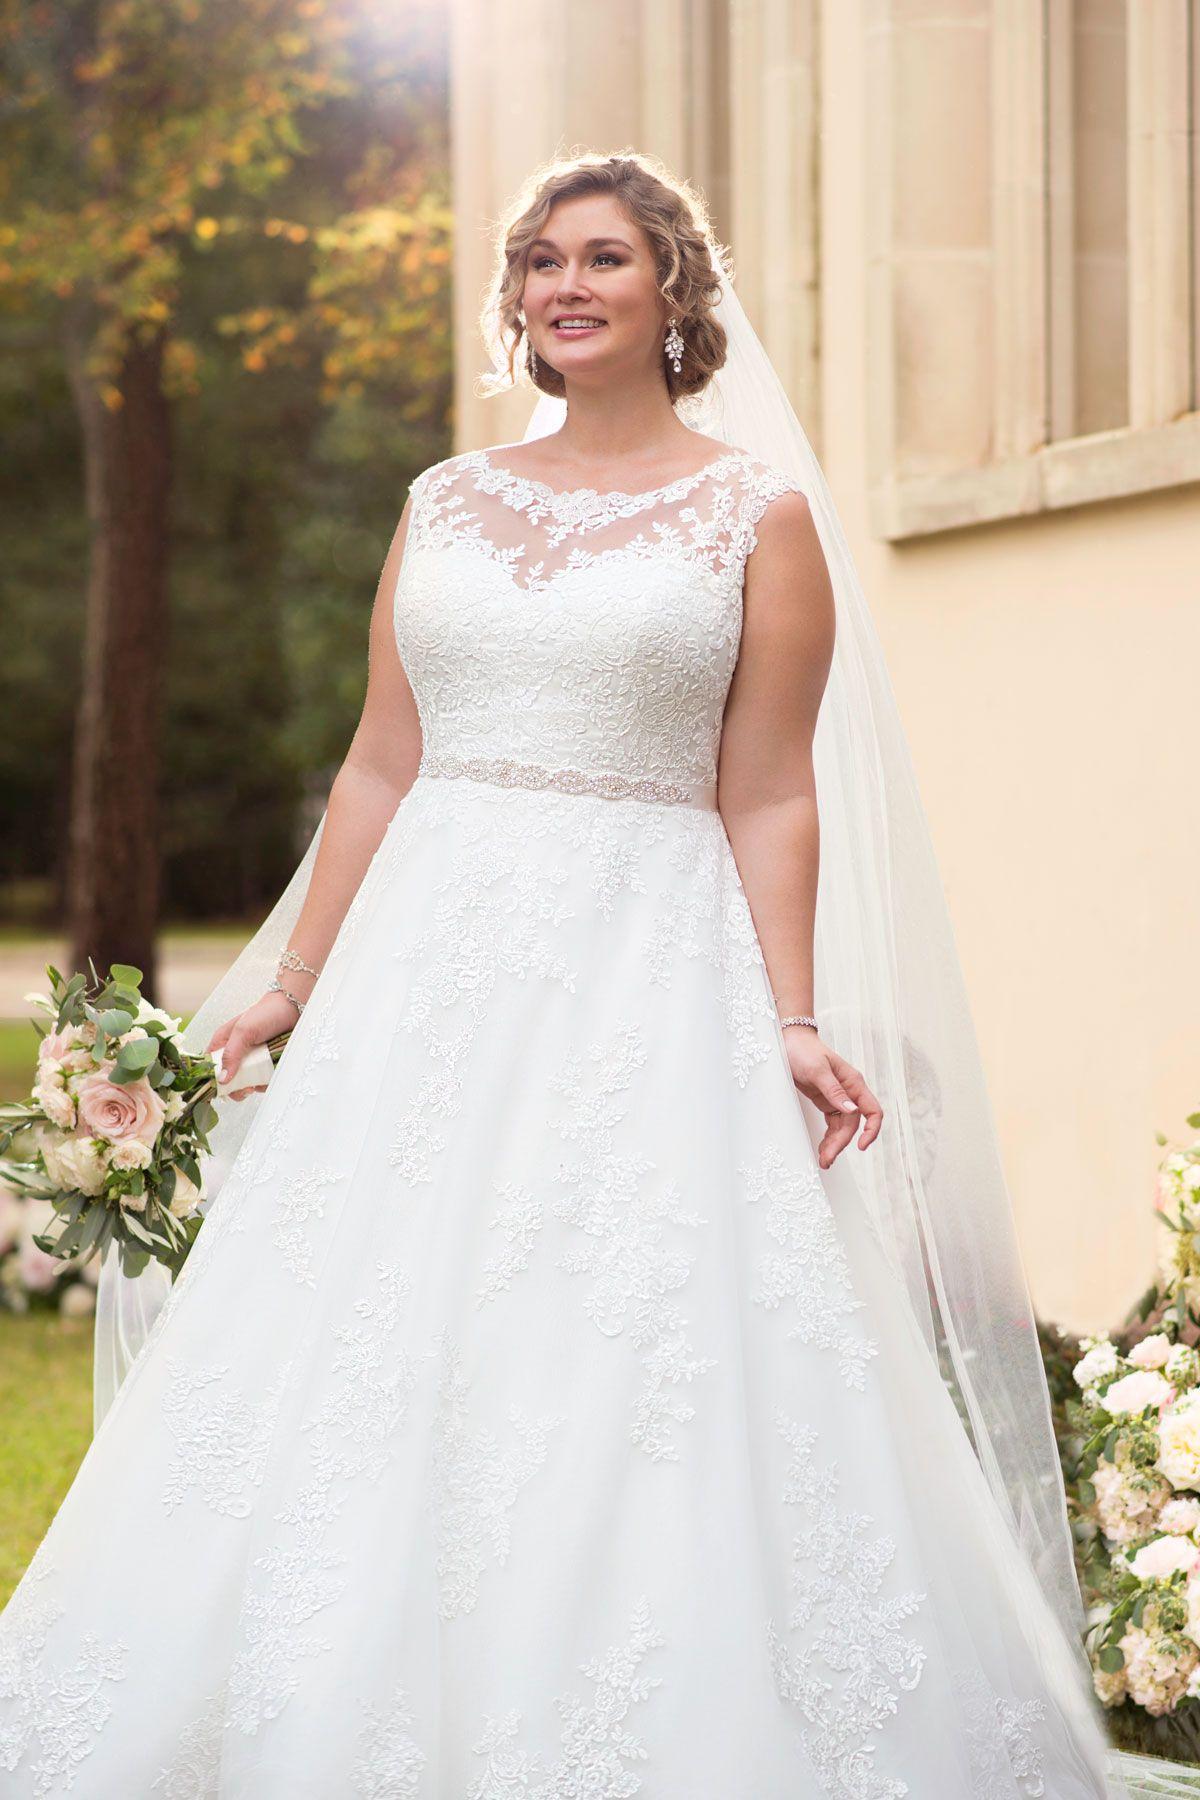 Wedding Dresses | Pinterest | Wedding dress, Wedding and Wedding